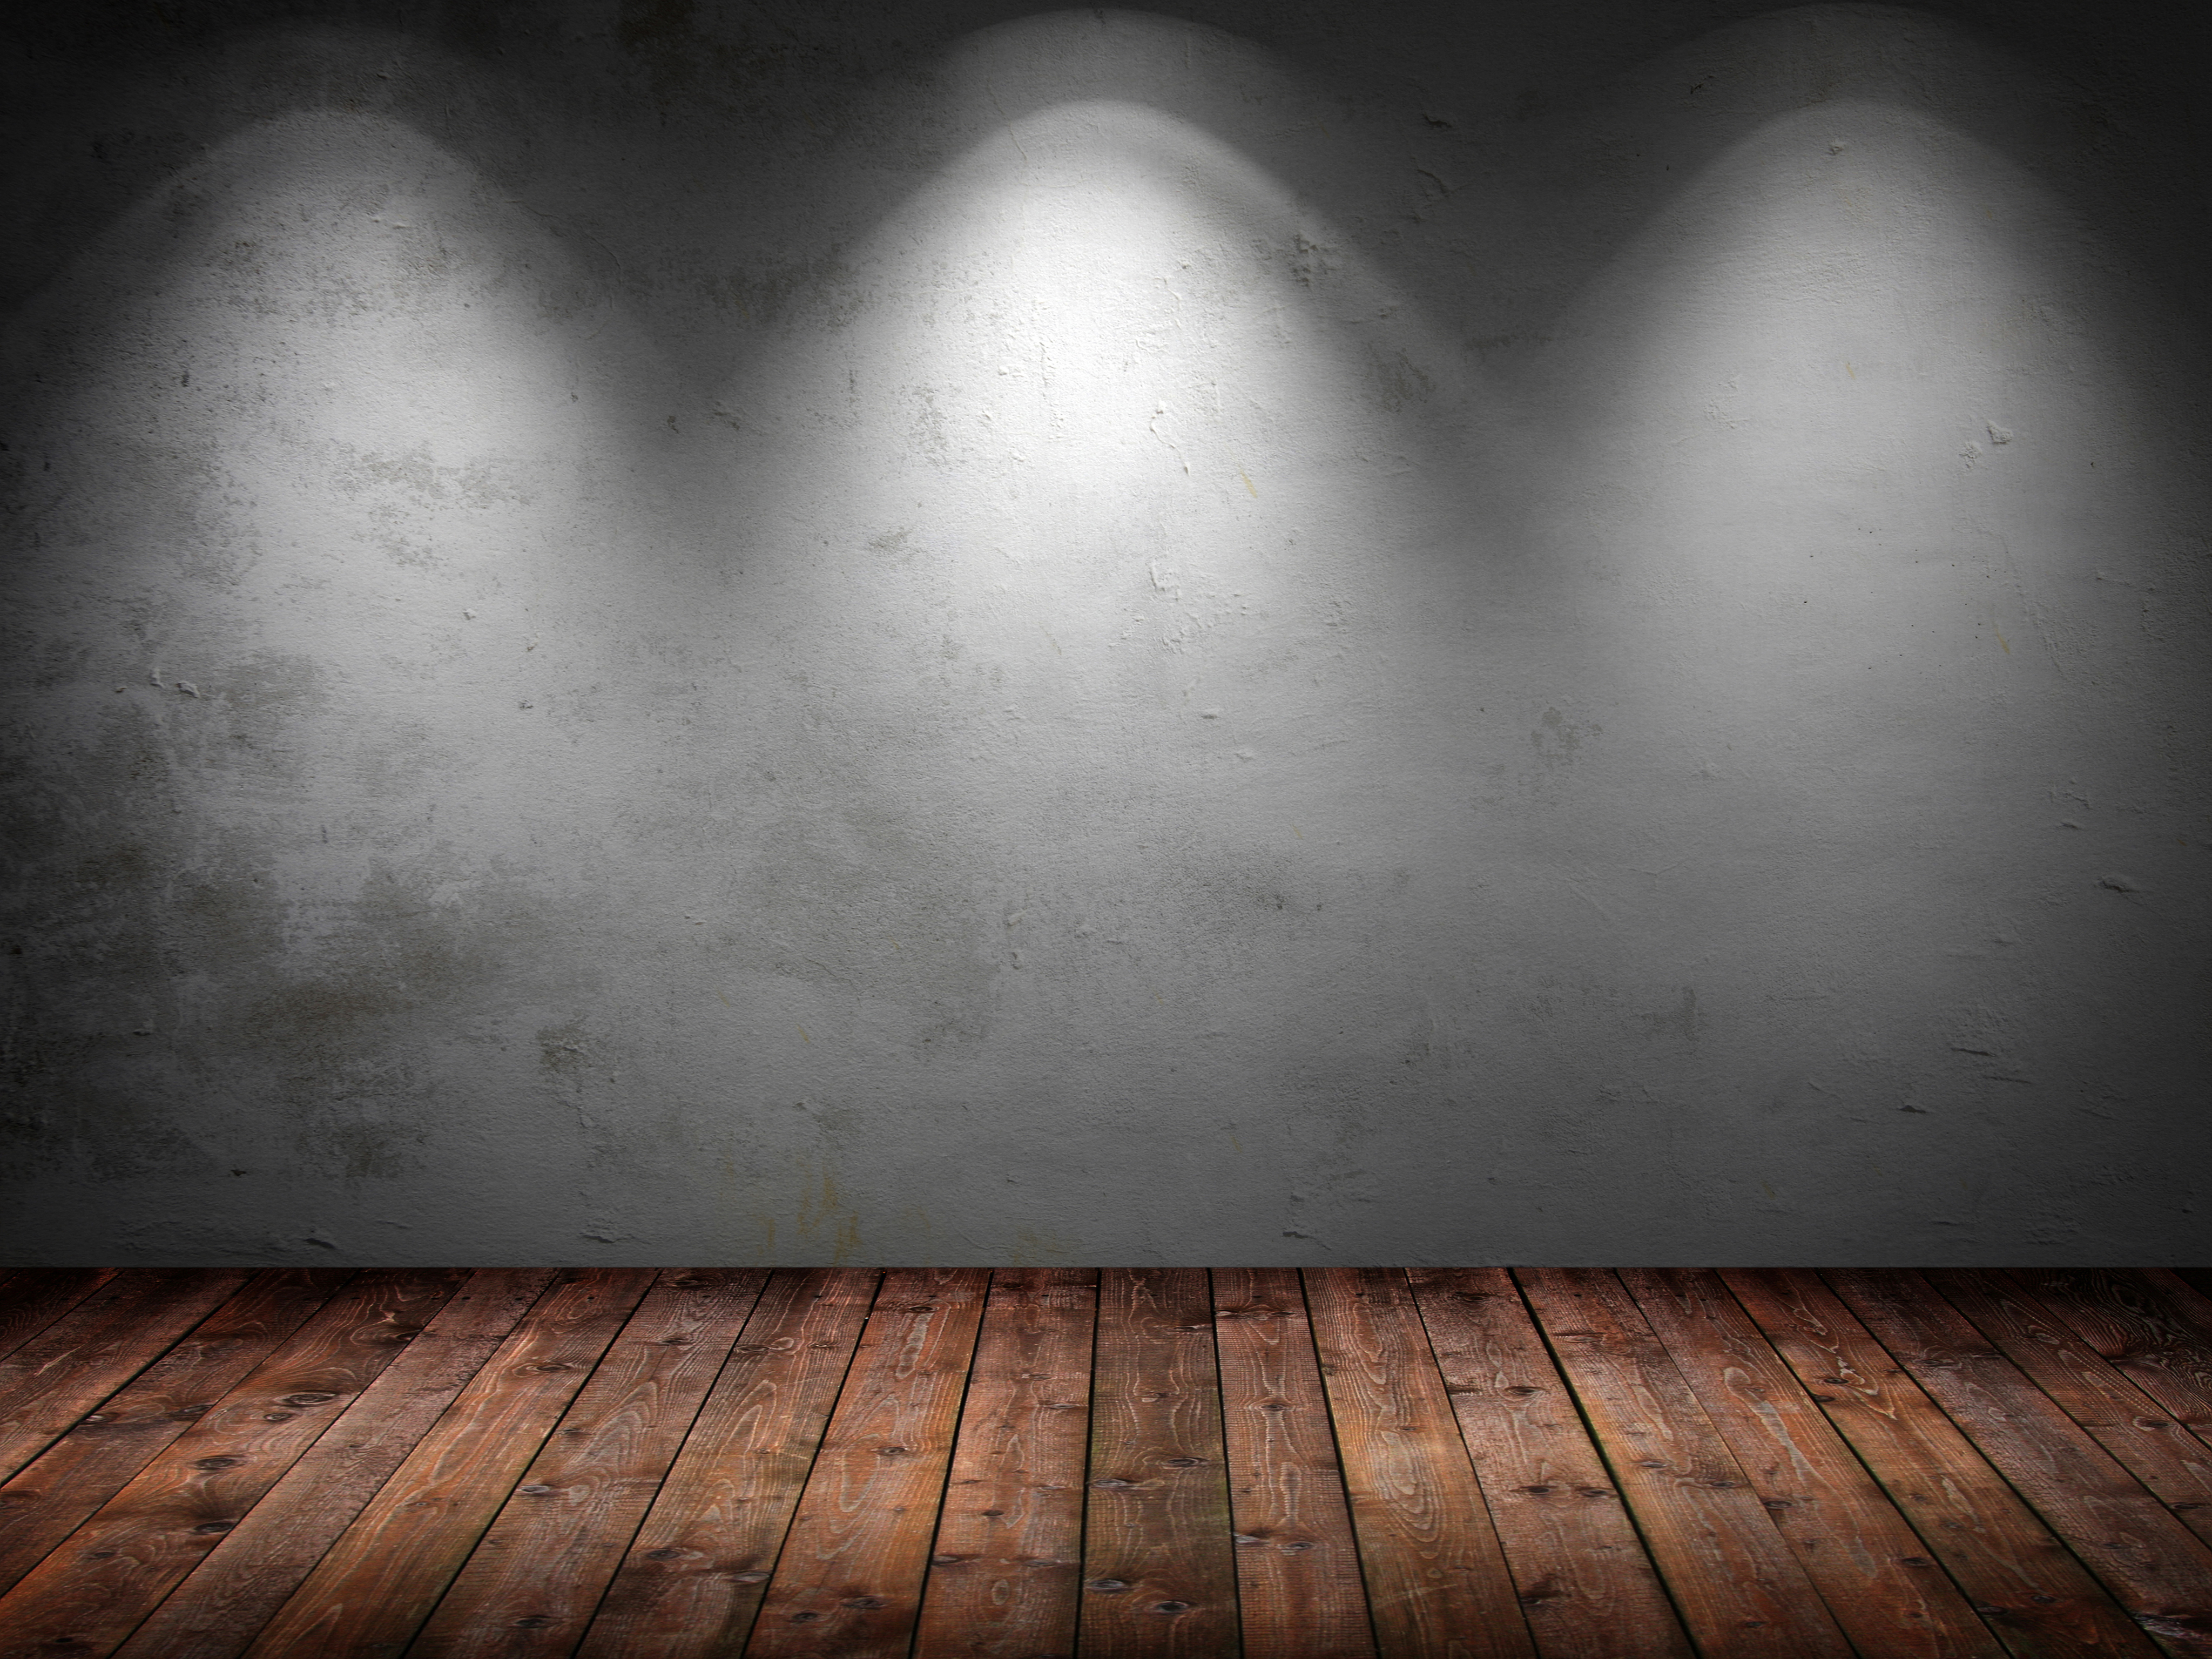 wood 4k ultra hd wallpaper hintergrund 4096x3072 id 392734 wallpaper abyss. Black Bedroom Furniture Sets. Home Design Ideas